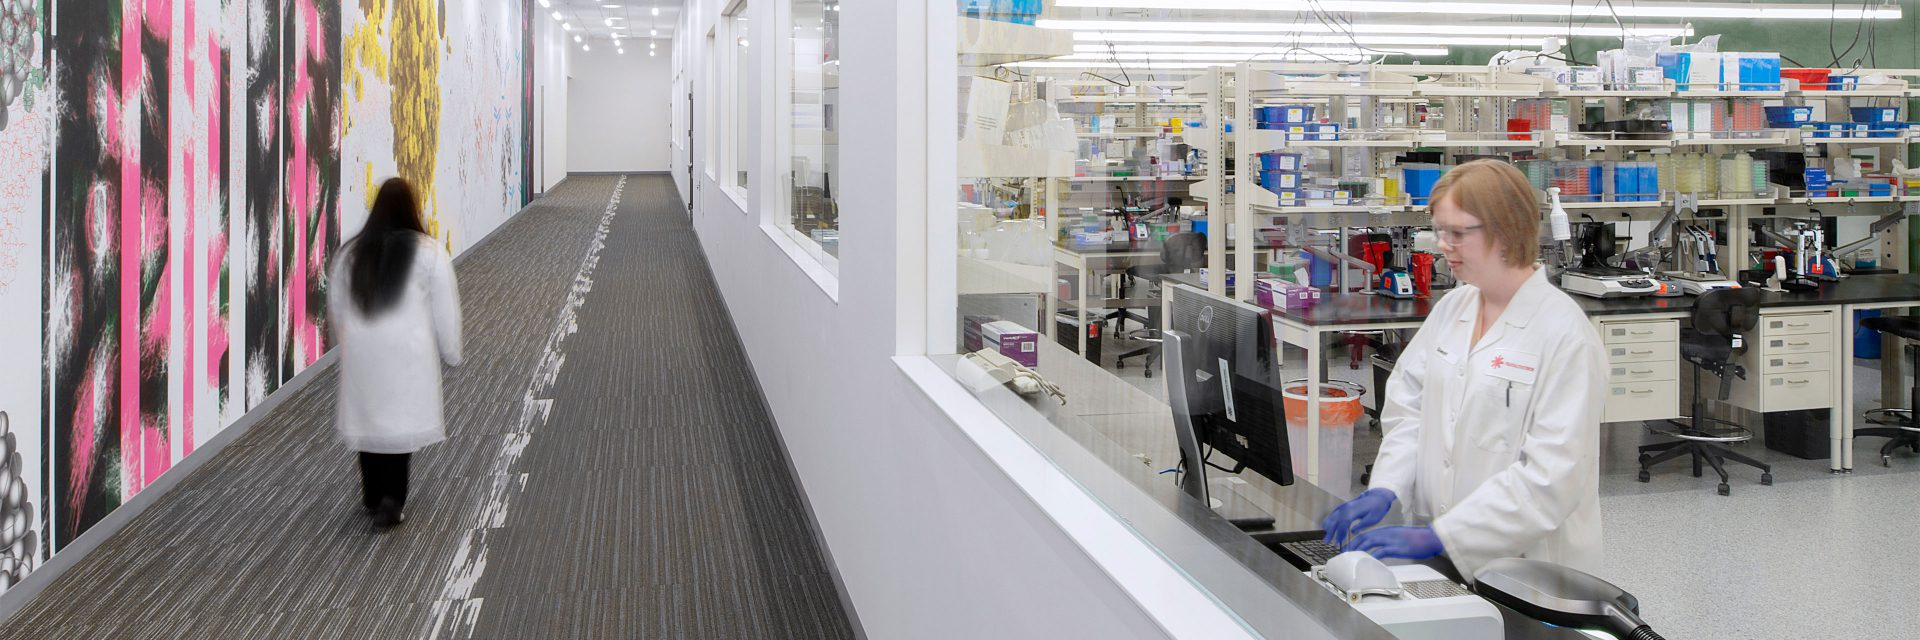 Bioanalytical Laboratory Facility Design + Construction